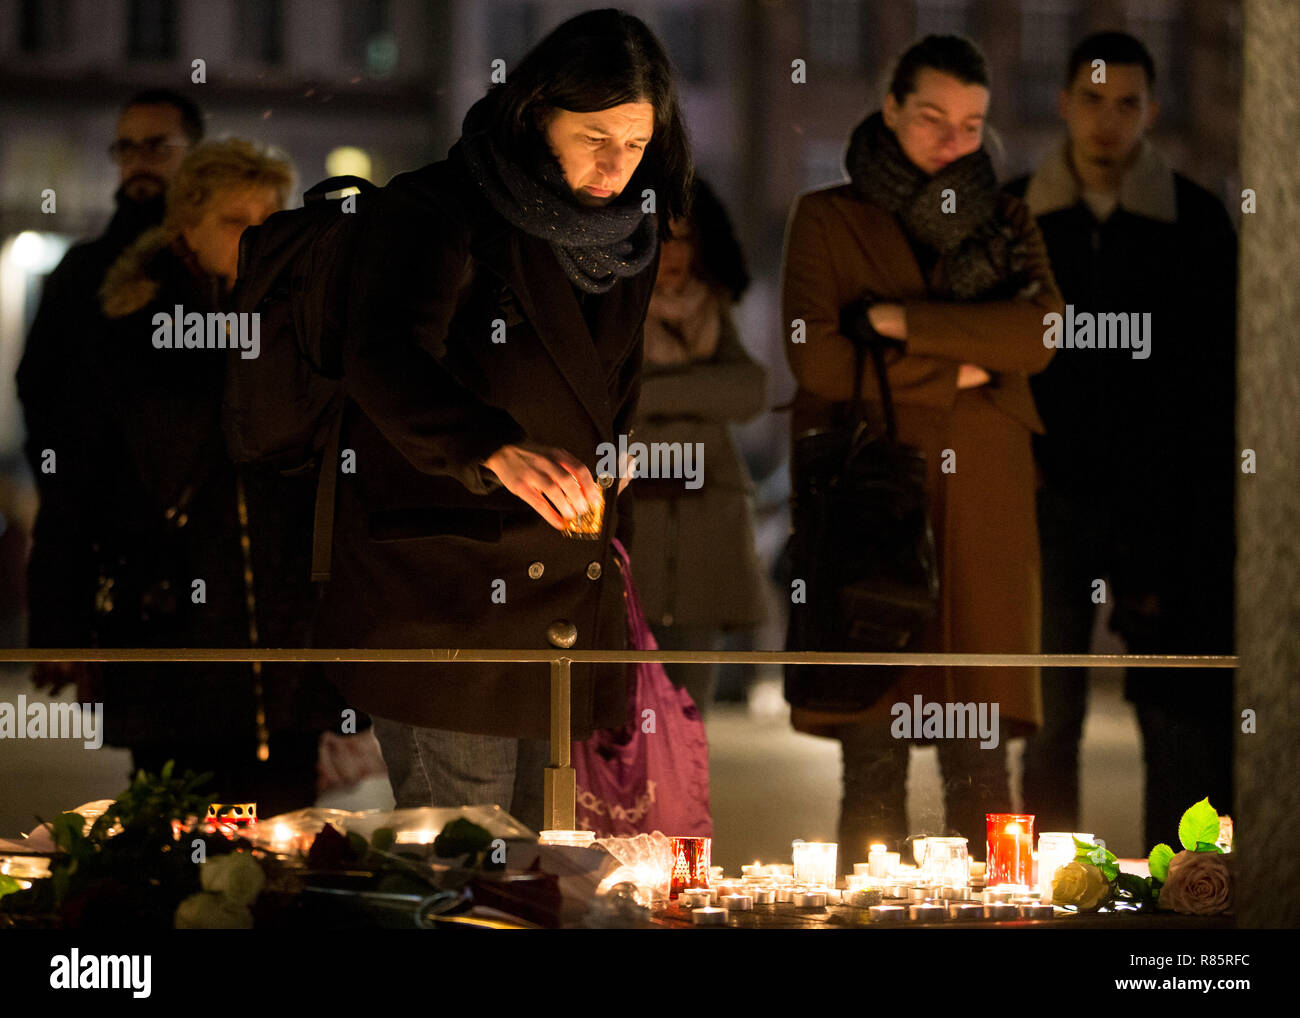 Strasbourg France 12th Dec 2018 A Mourner Seen Depositing A